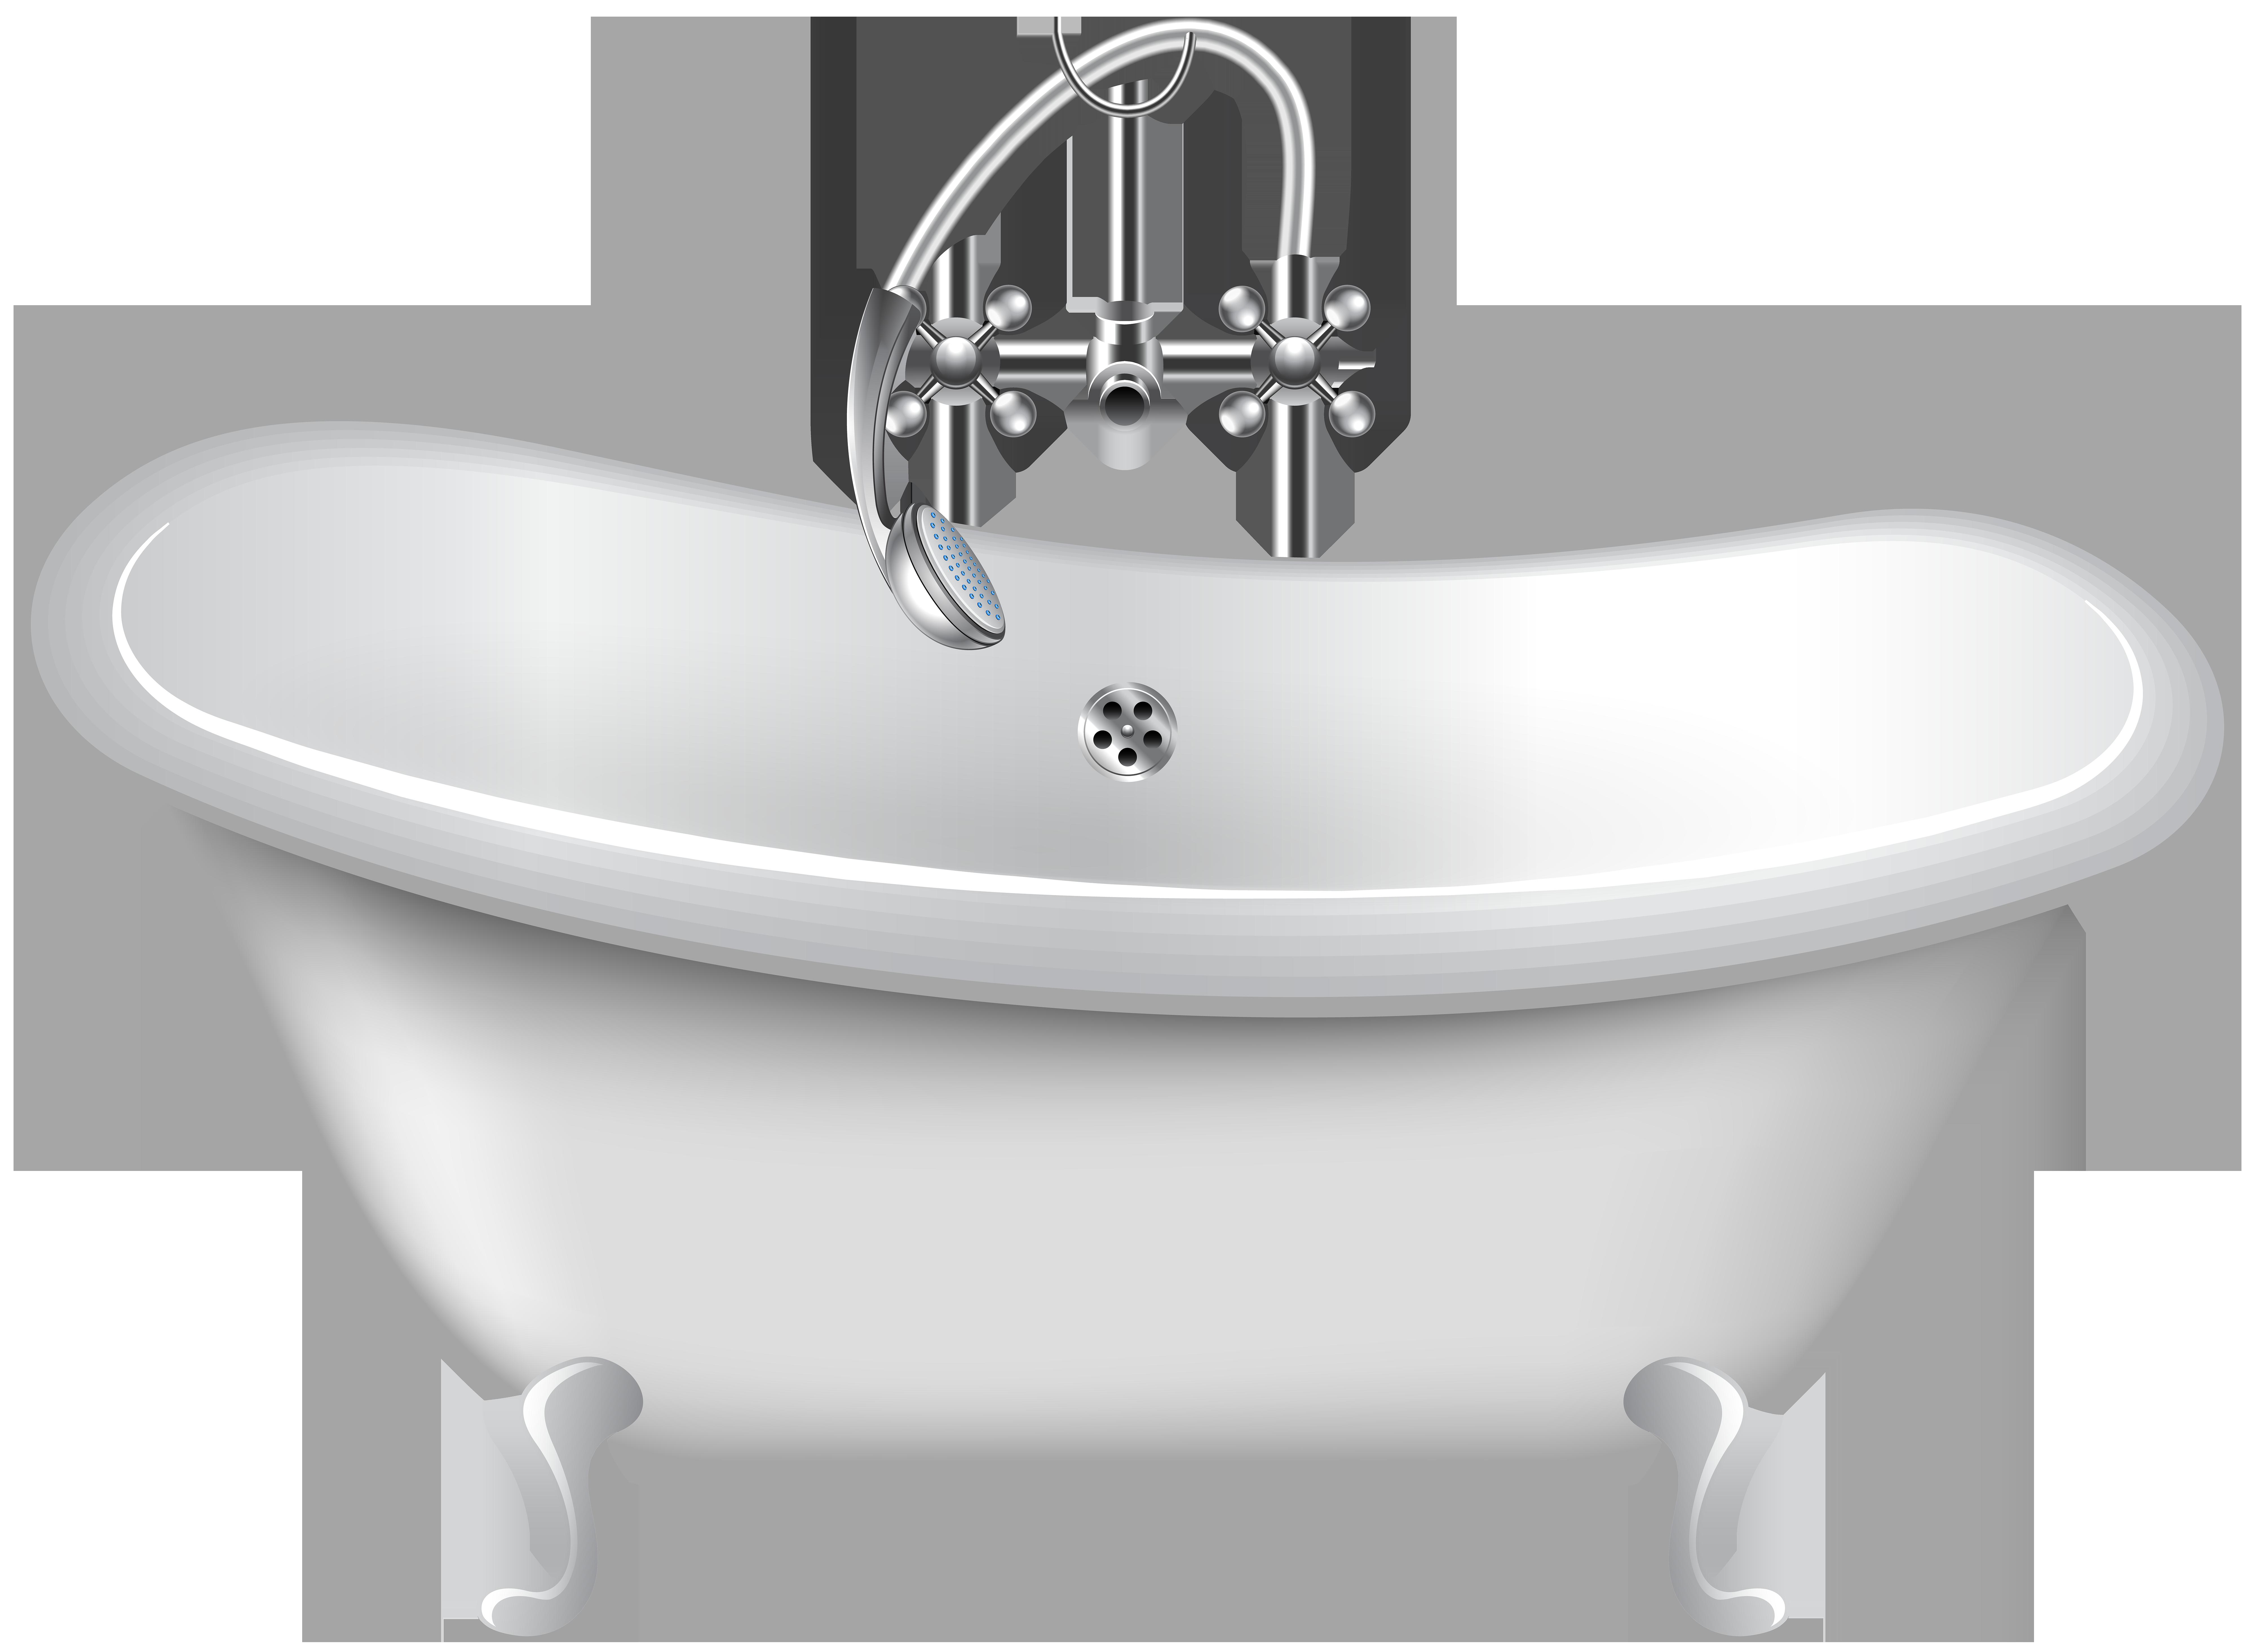 Bathtub png clip art. Clipart cup bath